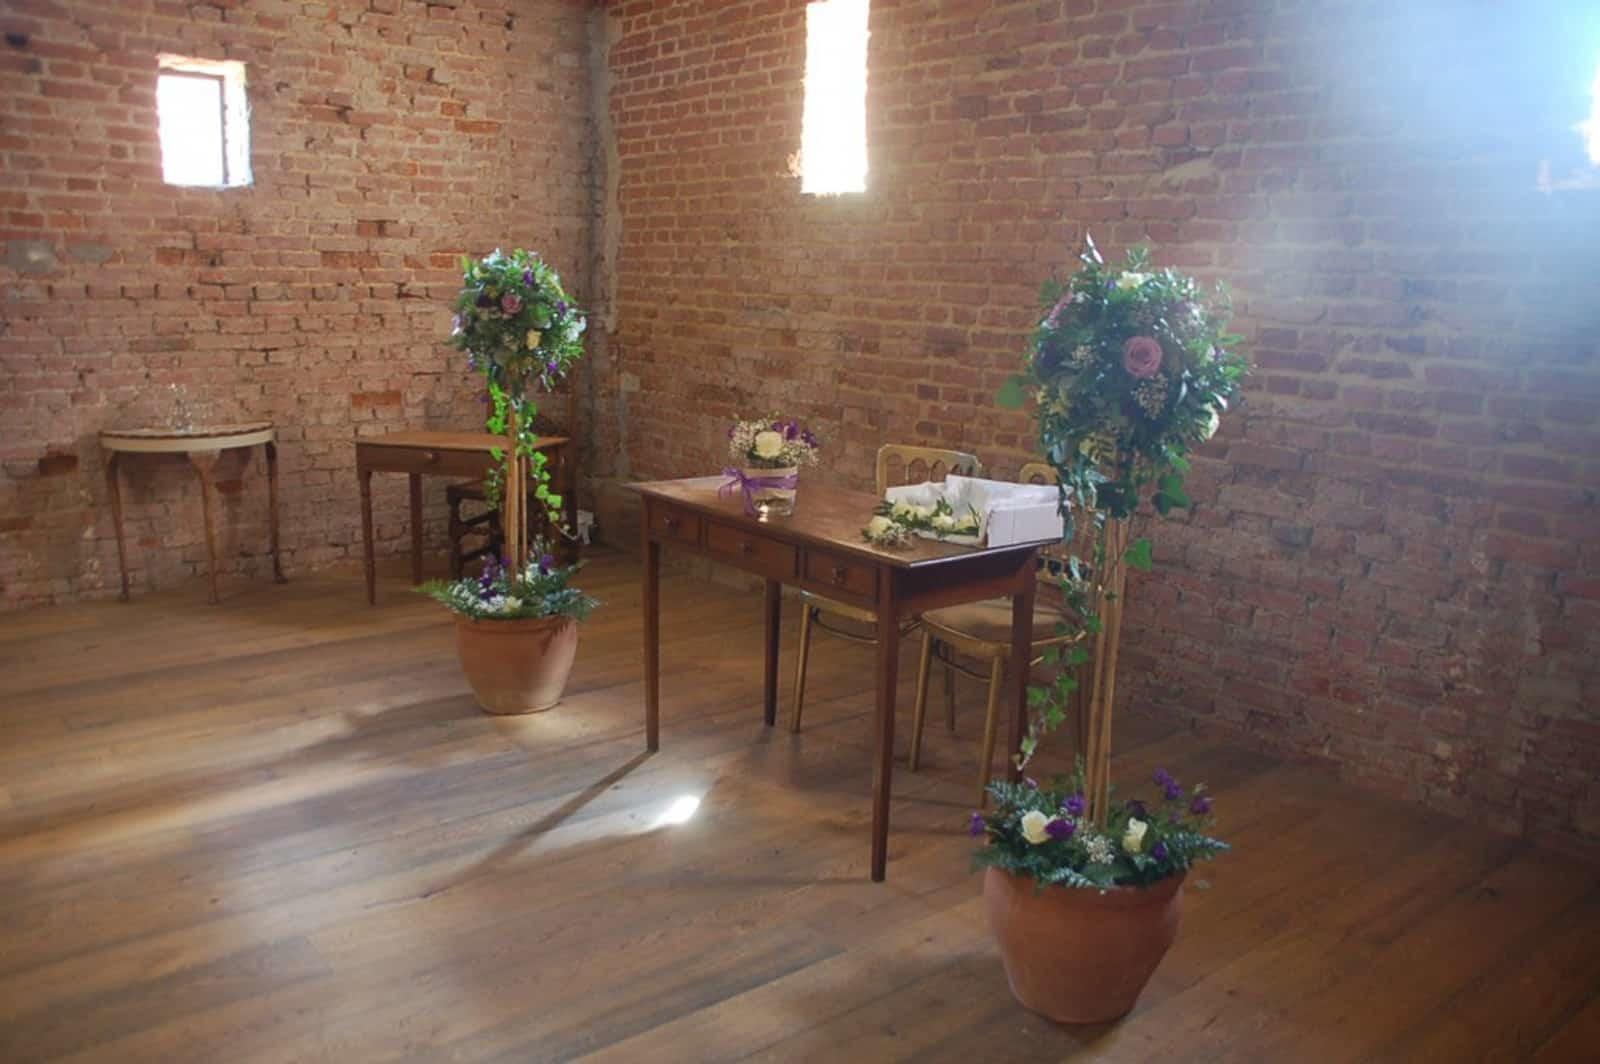 Reception Desk with standard floral display